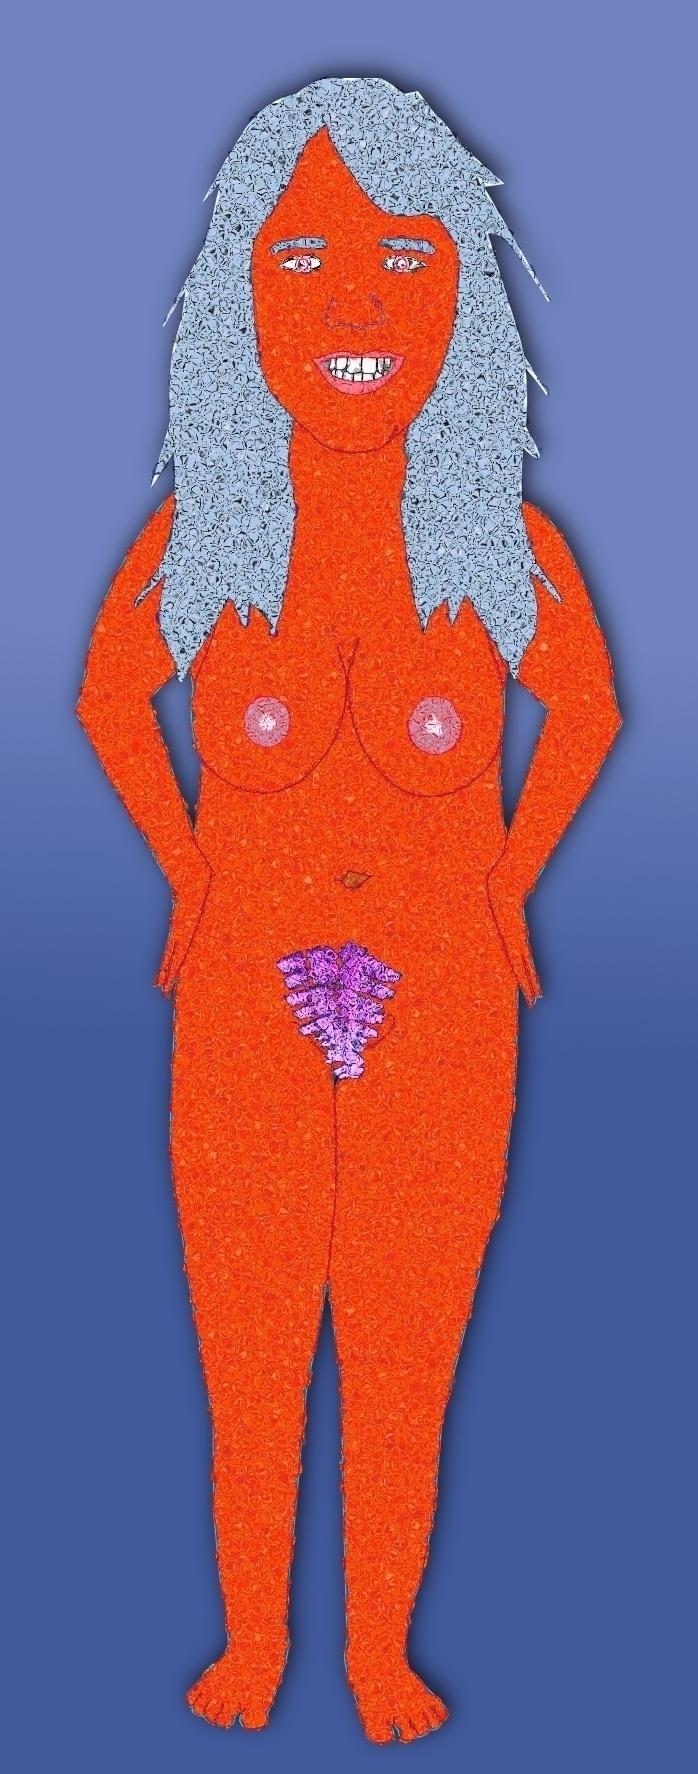 =.=.=.=.= impressionist - nude, ErinP - coochdawg | ello